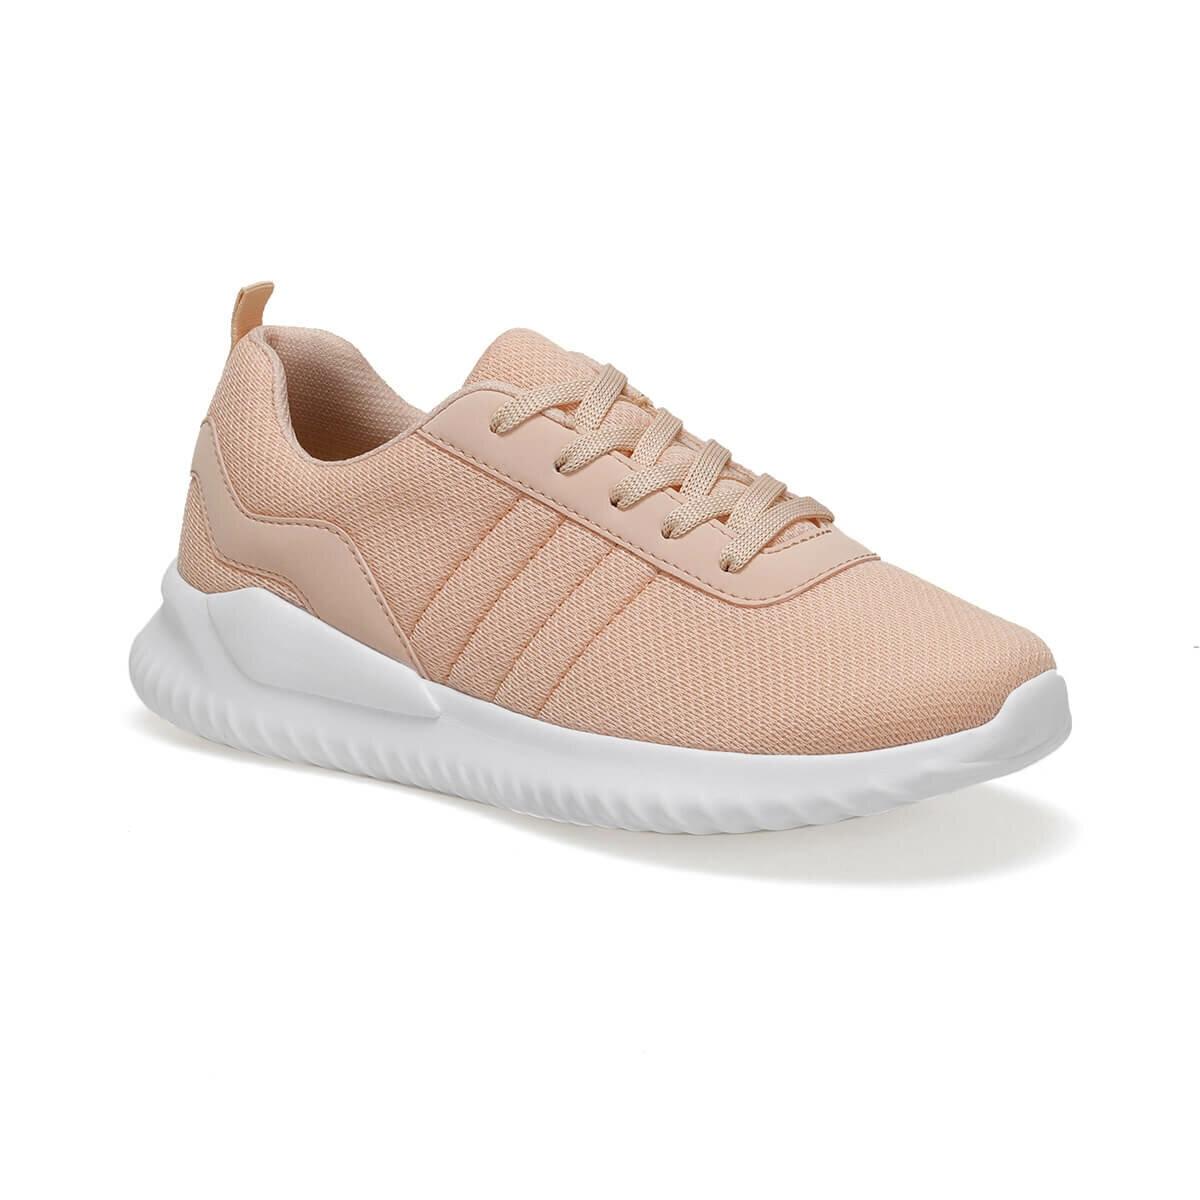 FLO PERRY W Salmon Women Sneaker Shoes Torex Hiking Shoes     - title=